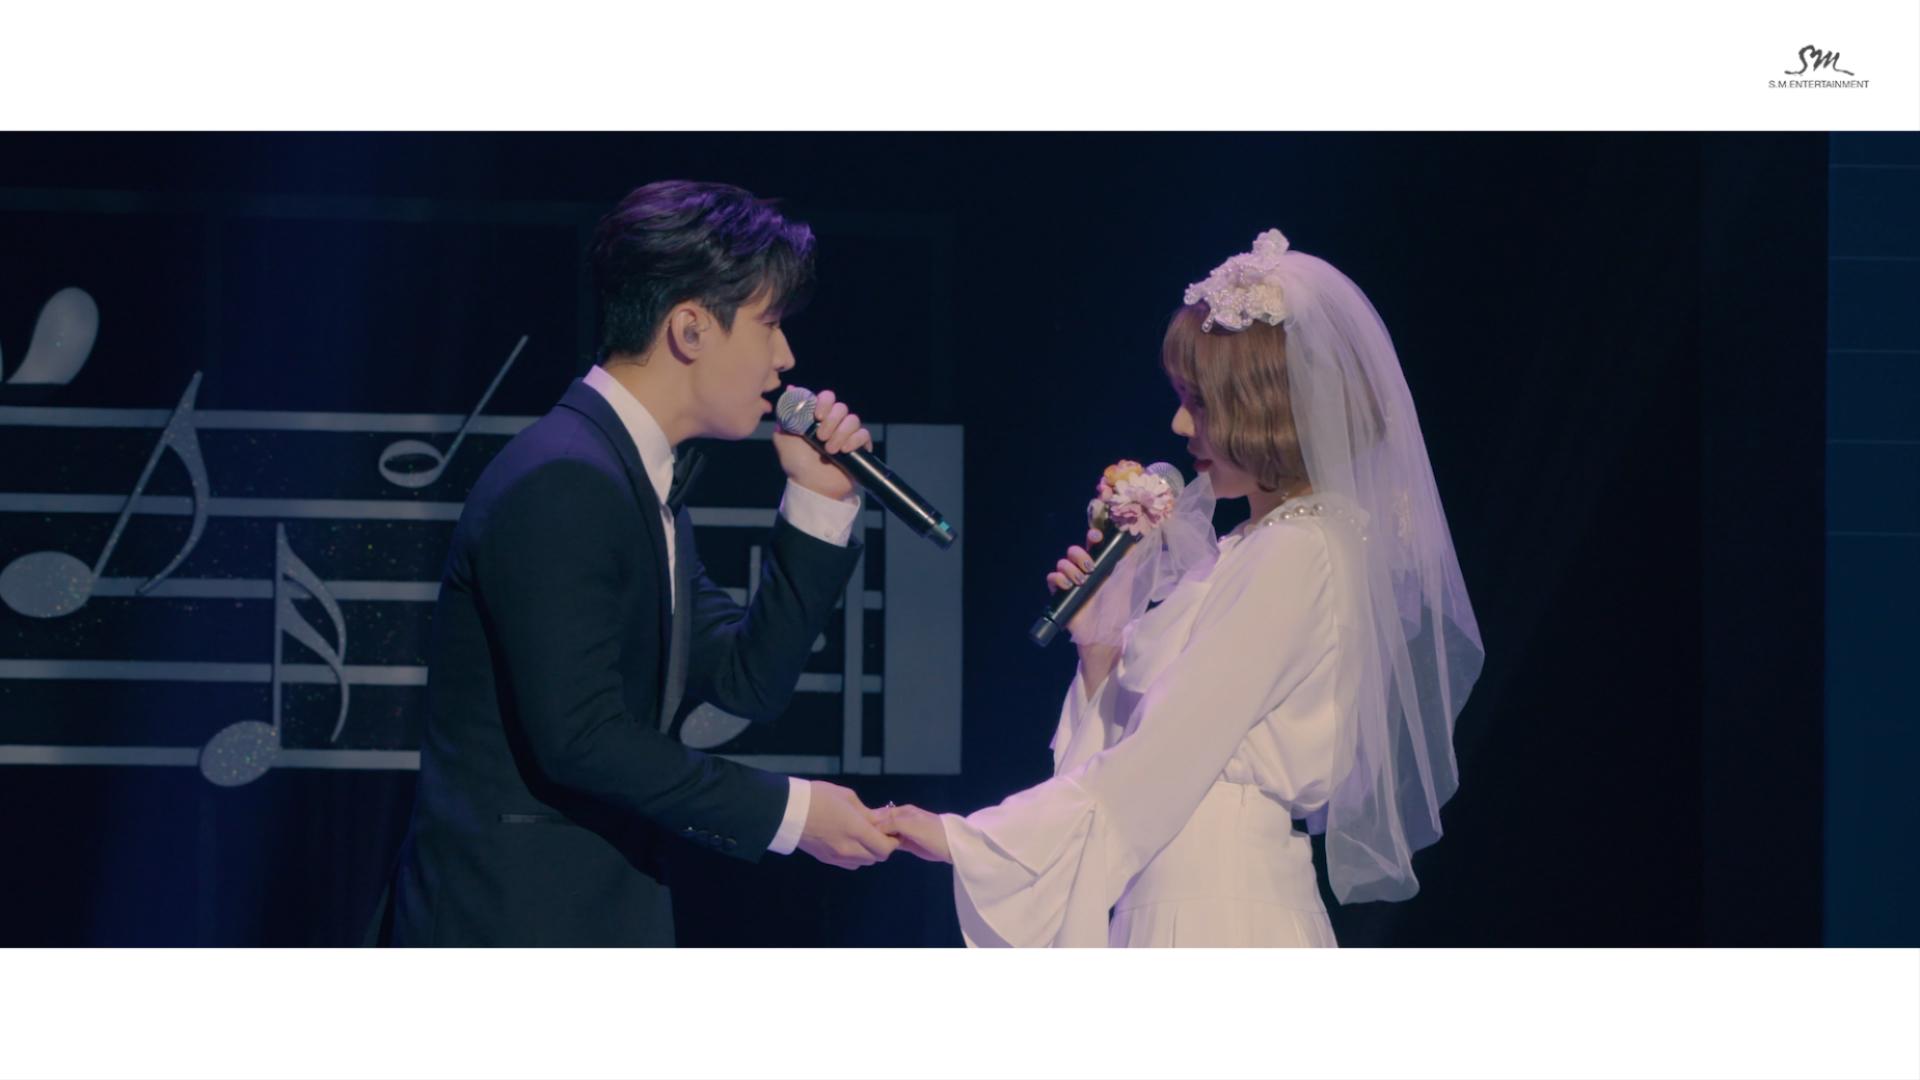 [STATION] 써니 (SUNNY) X HENRY_쟤 보지 마 (U&I)_Music Video